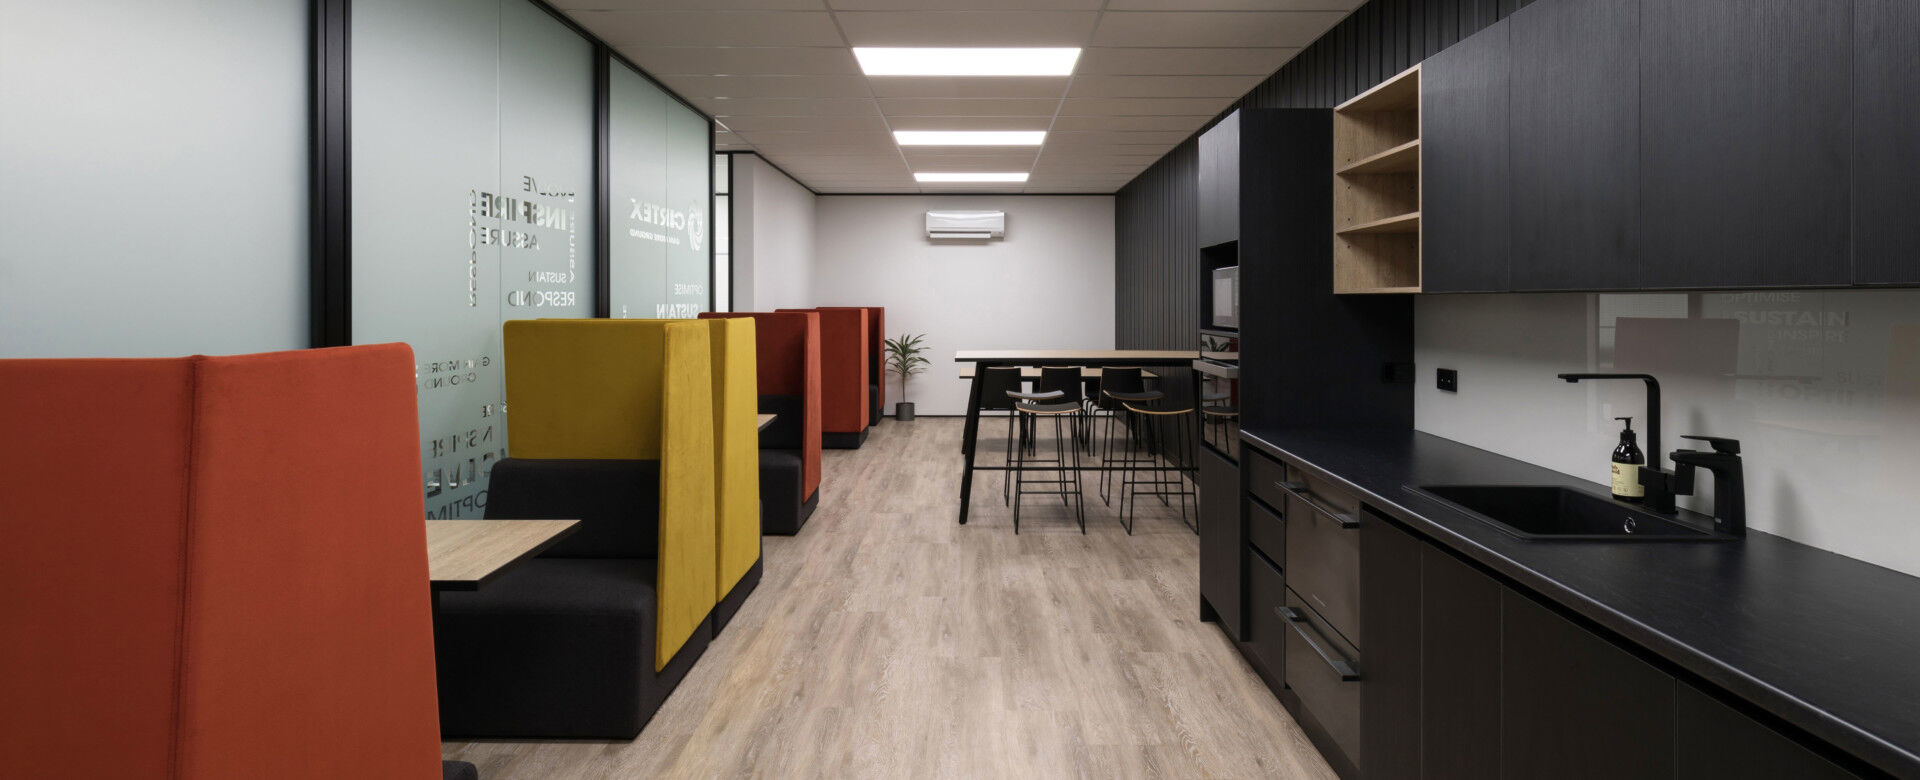 Cirtex Industries Office Cafeteria Hero